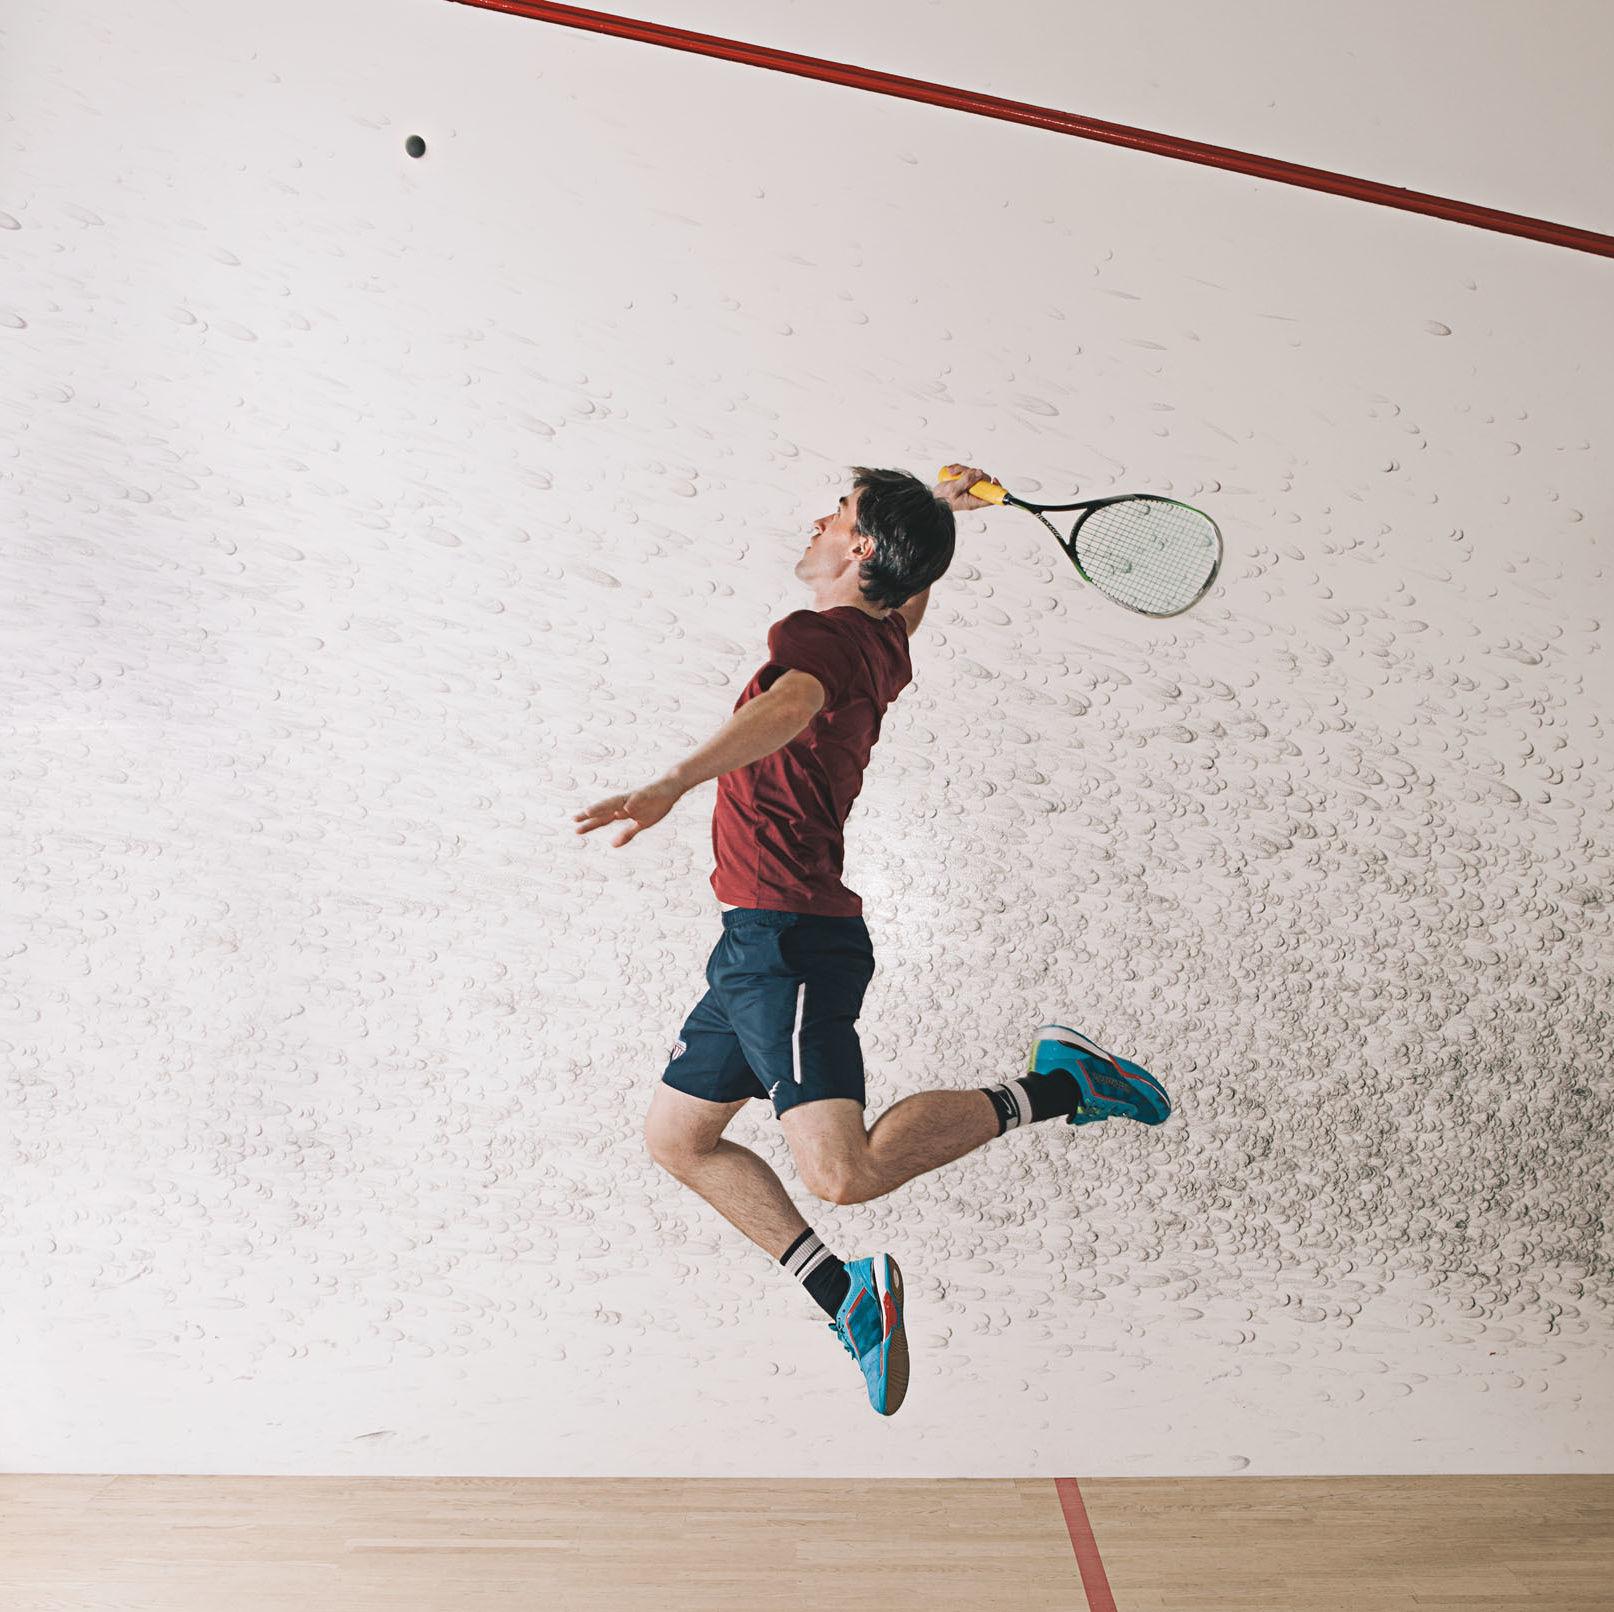 Pomo 0117 lss julian illingworth squash player fw1aia